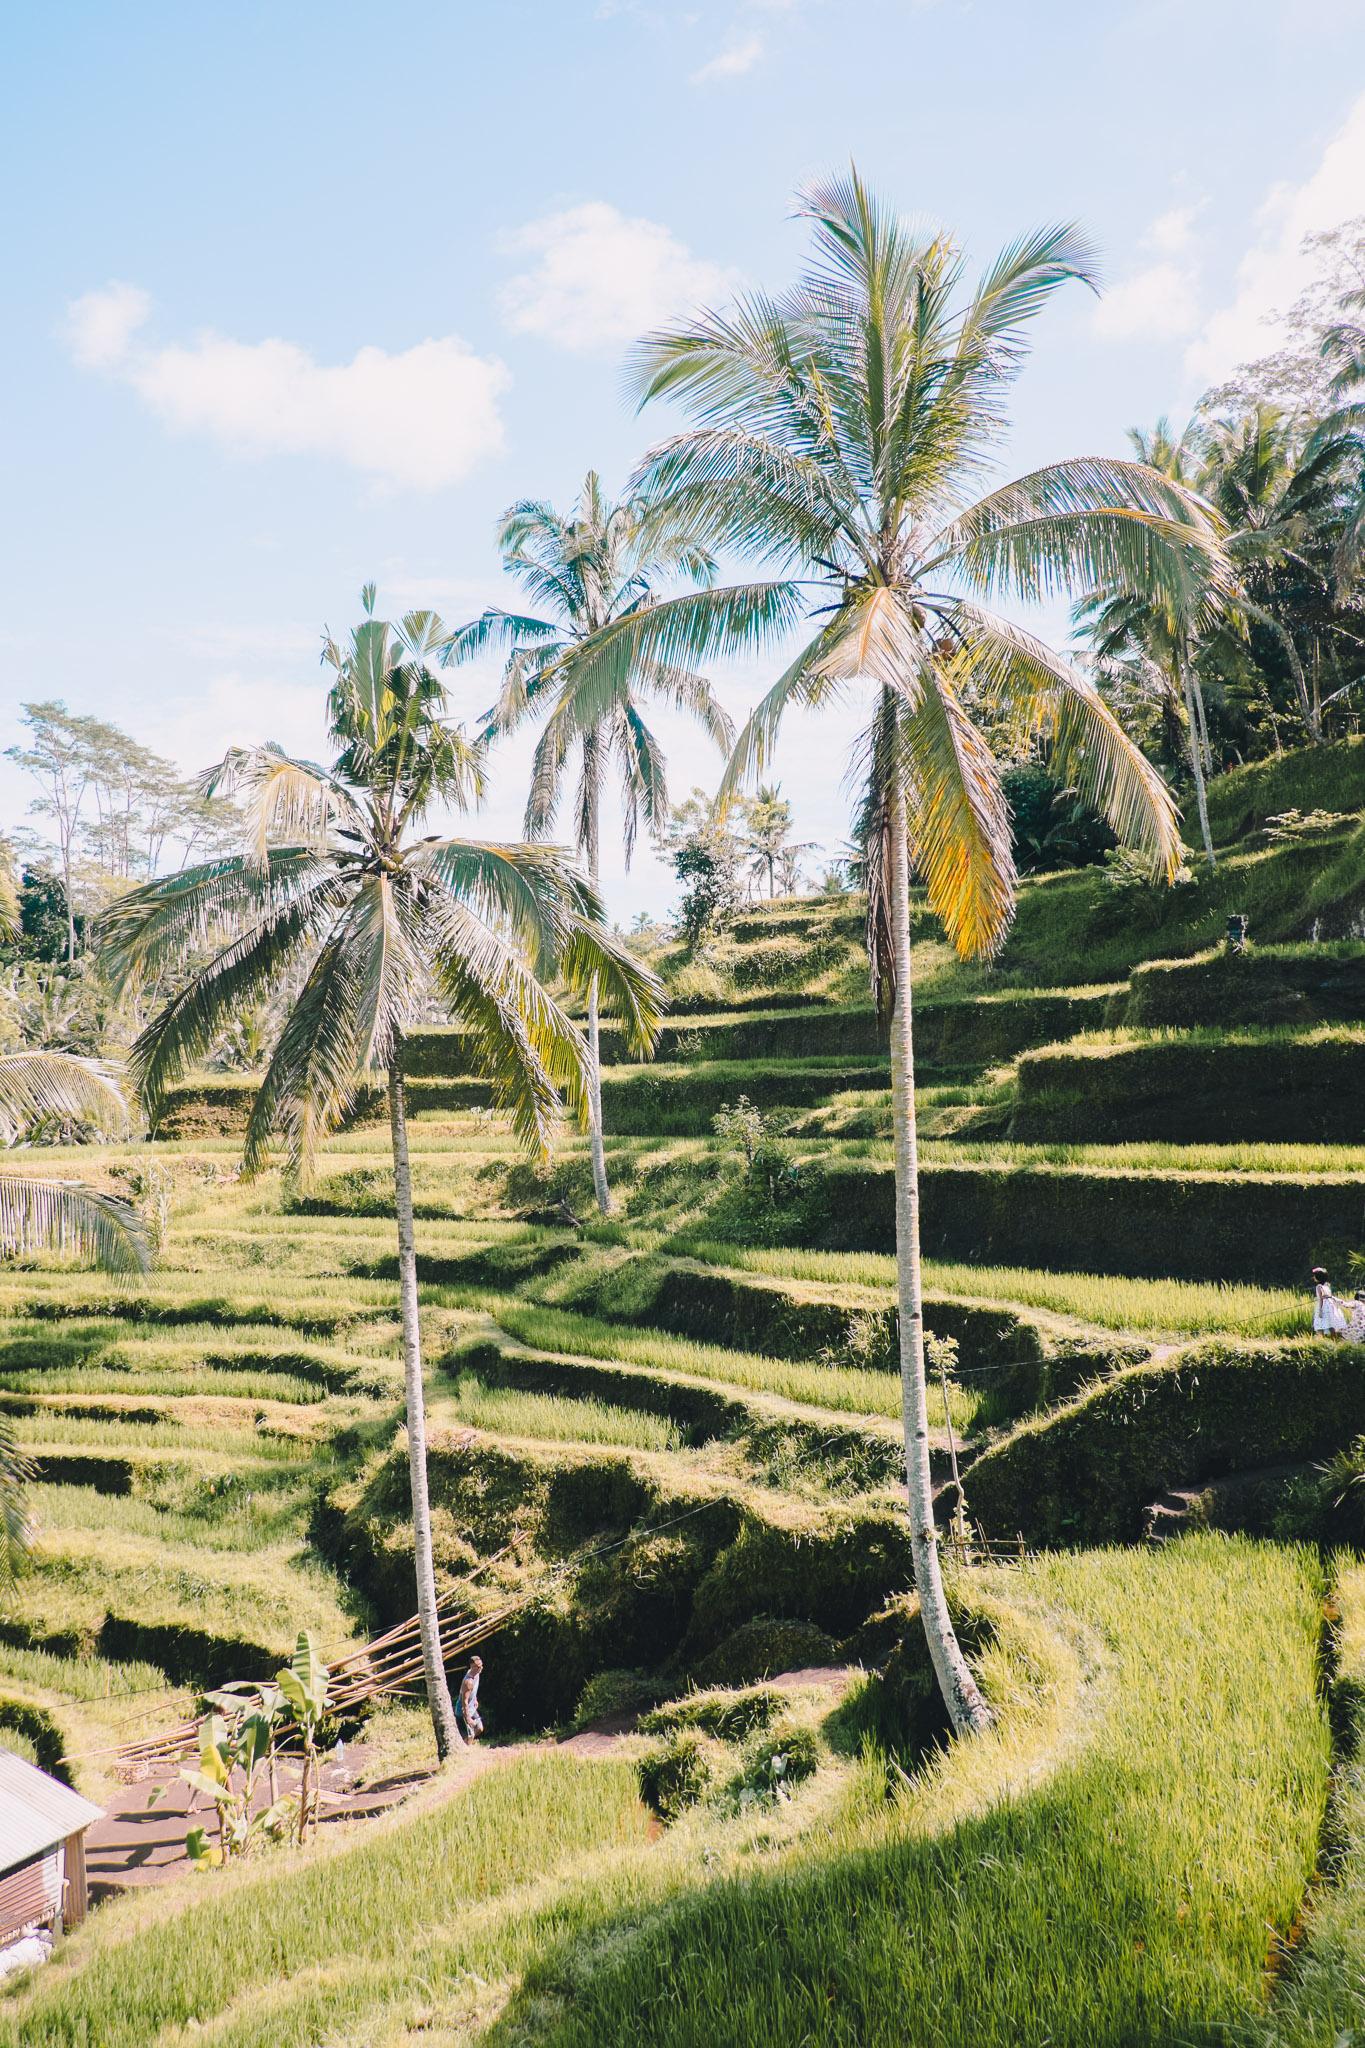 indonesia-bali-rice-fields-7.jpg